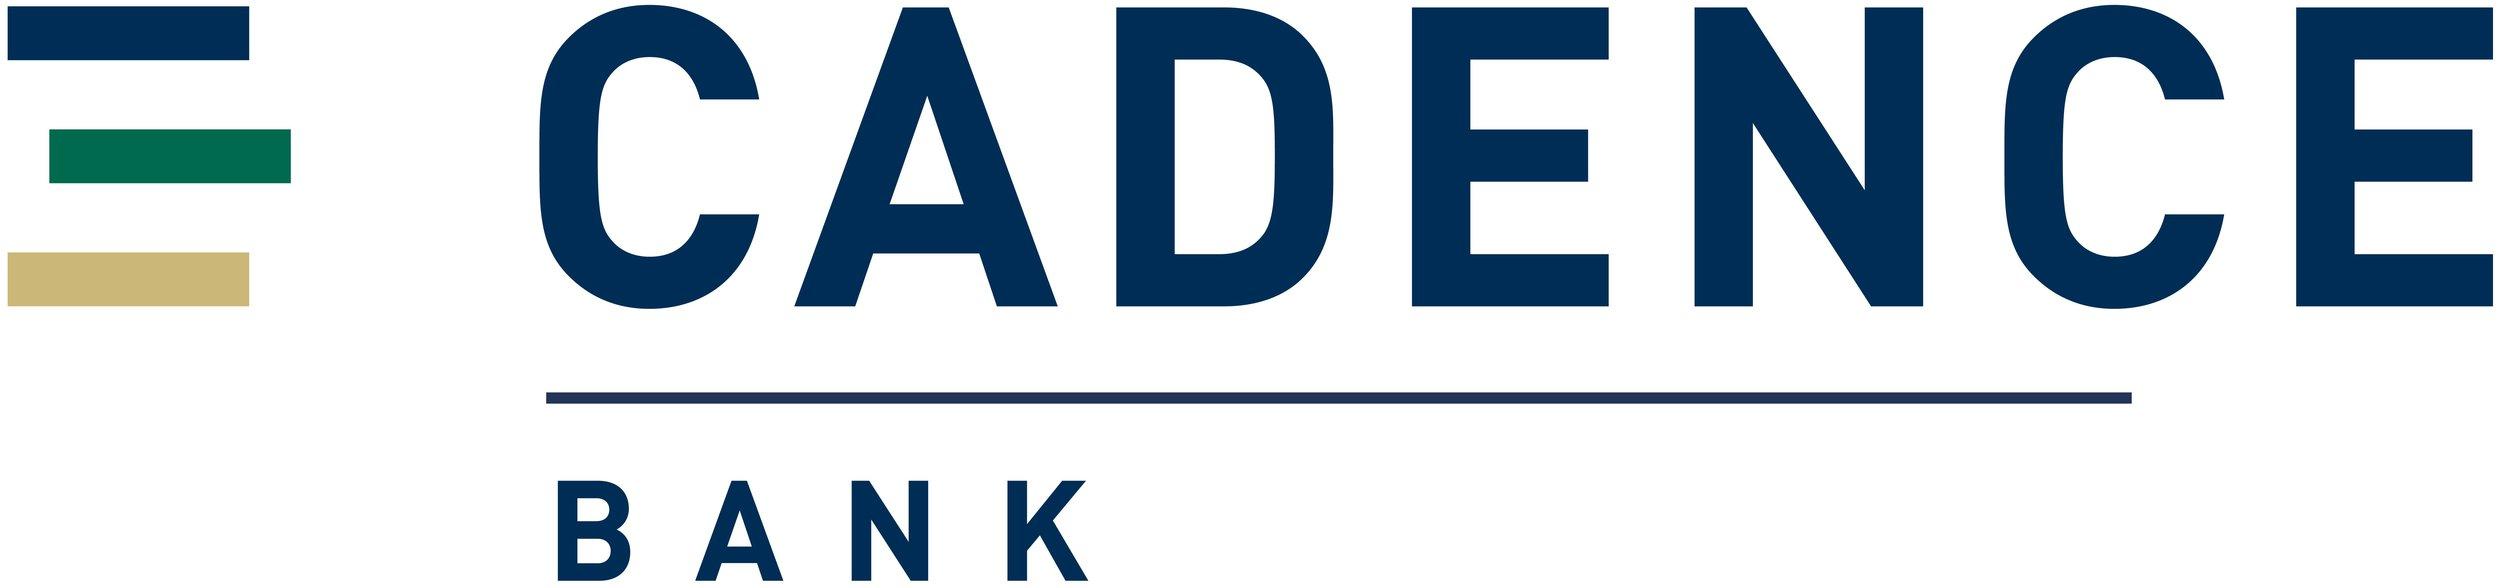 CADENCE-logo-JPEG.jpg